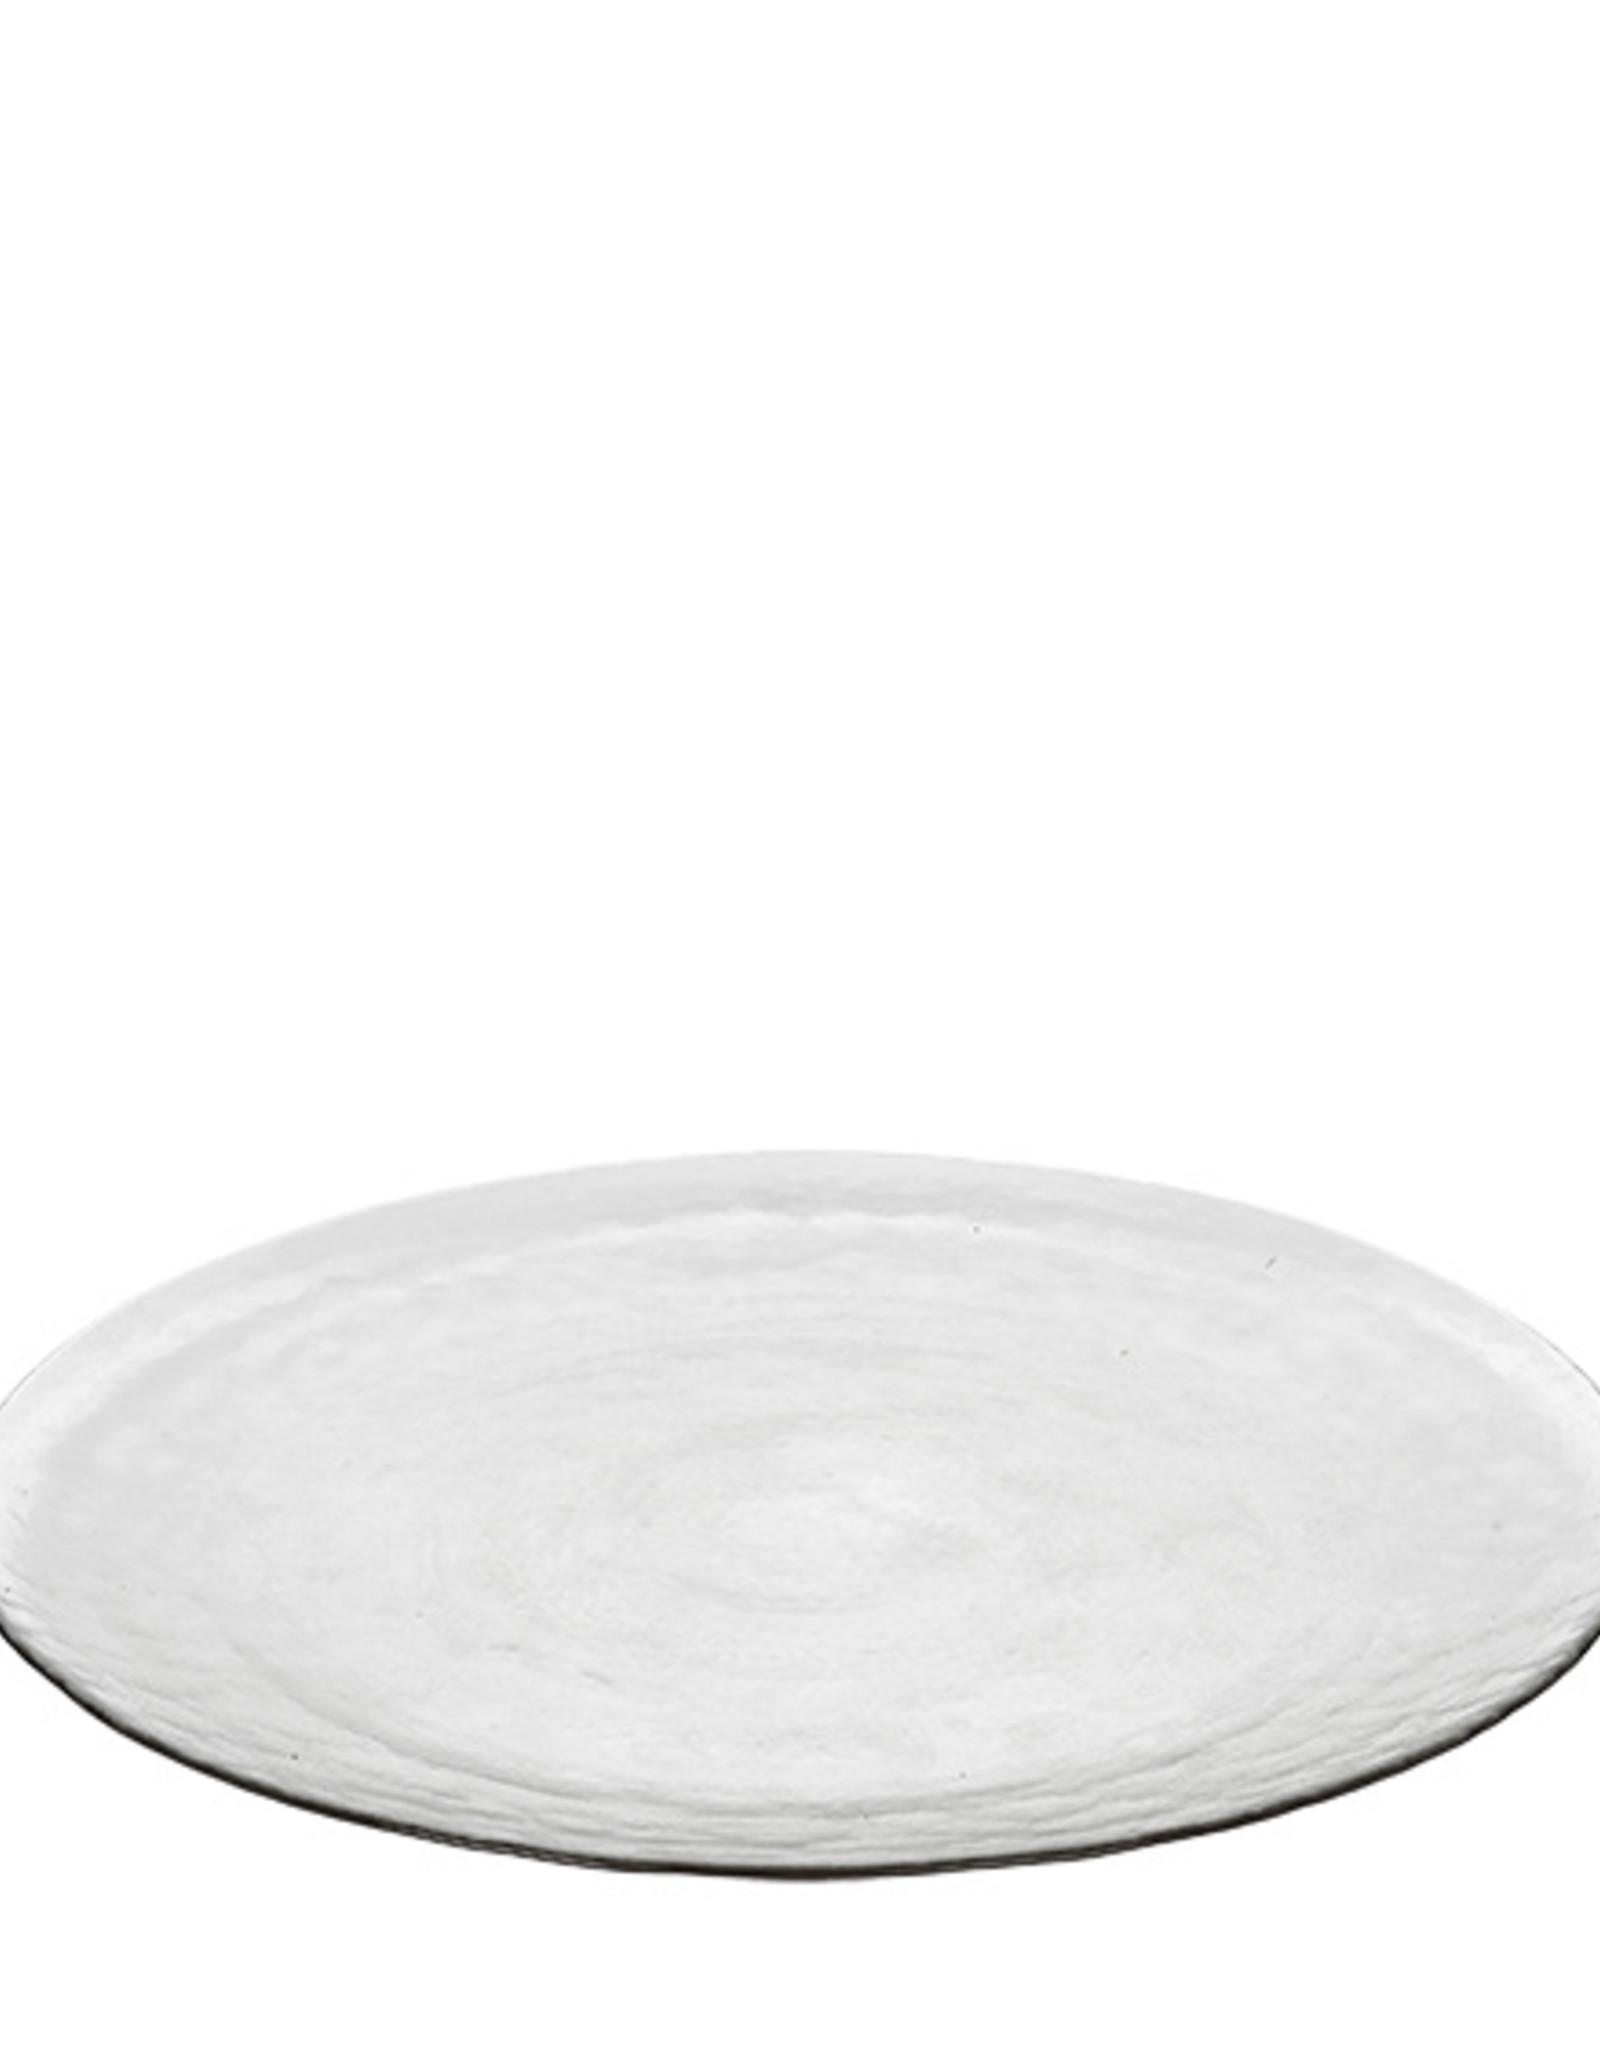 broste copenhagen Large plate hammered glass